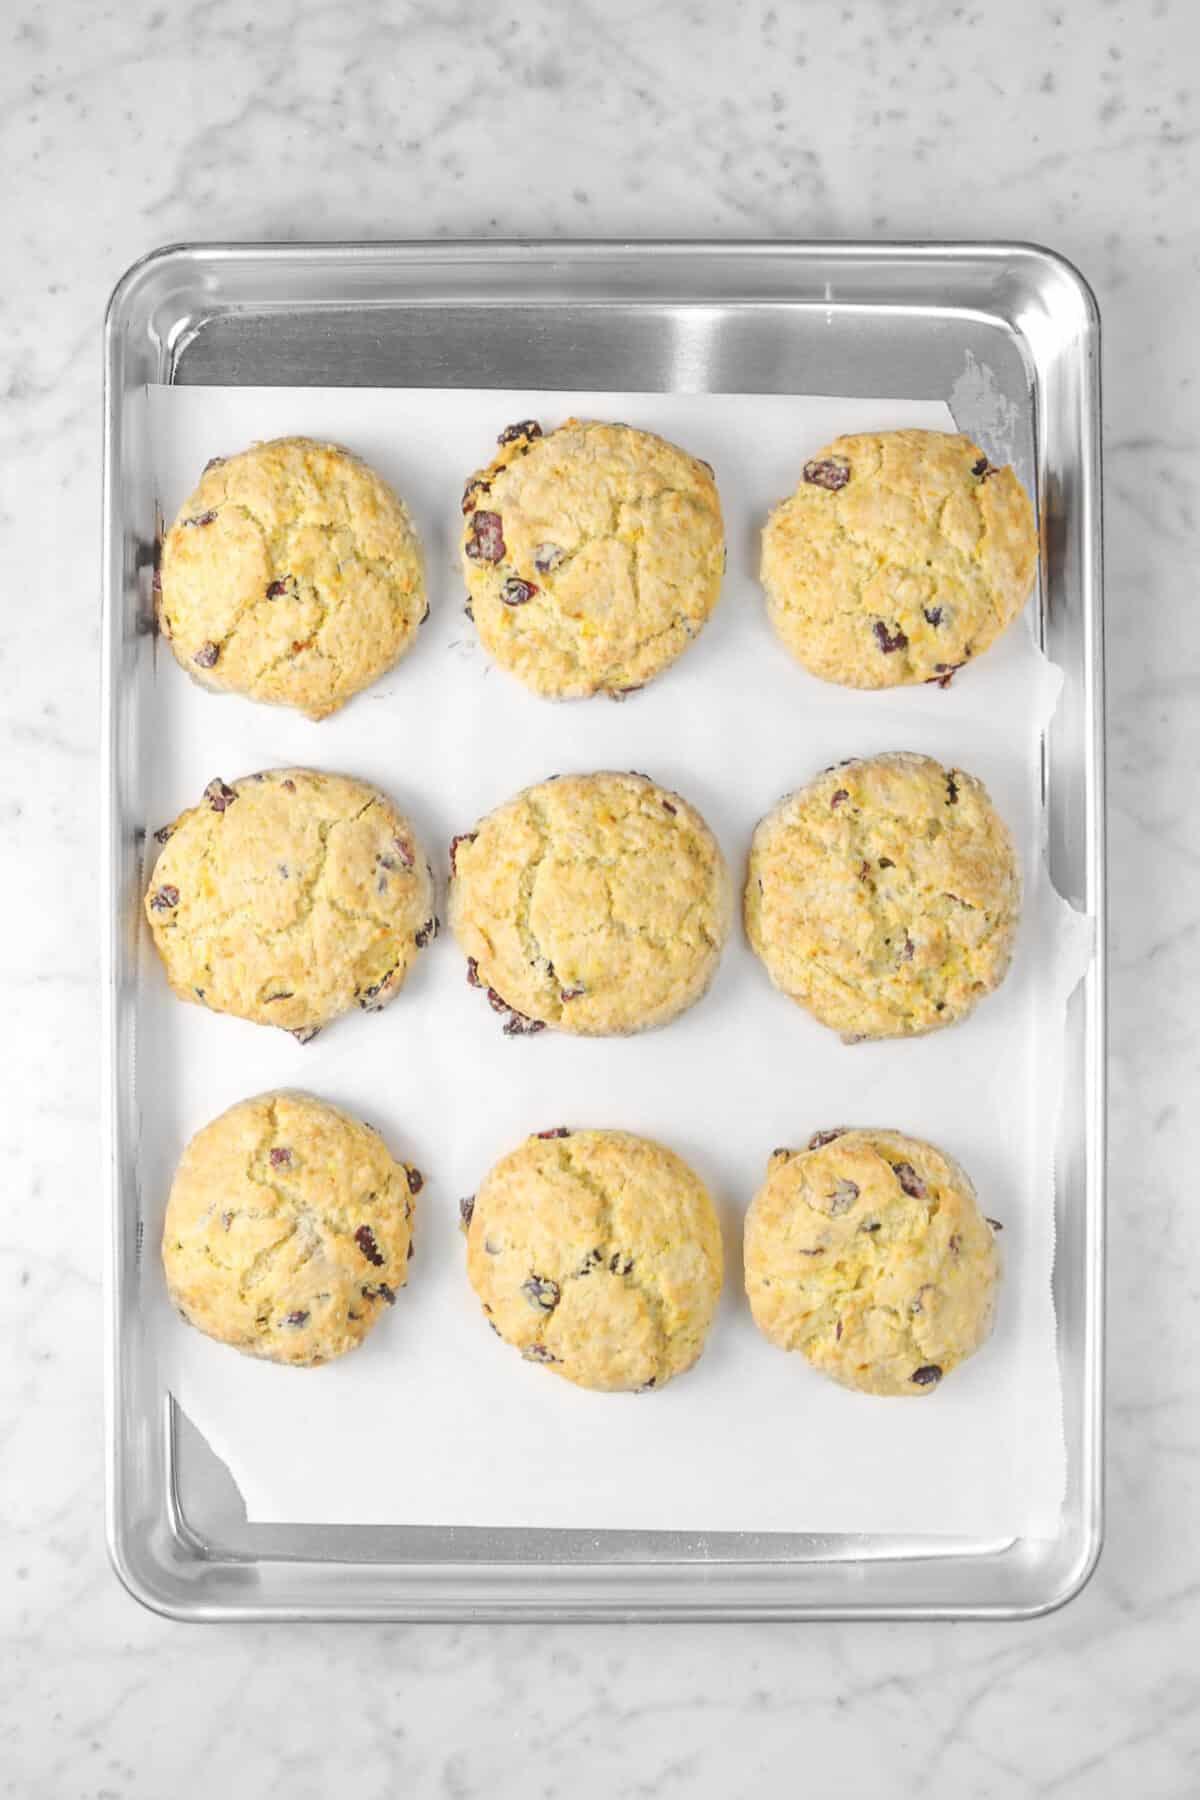 nine baked orange cranberry scones on a sheet pan